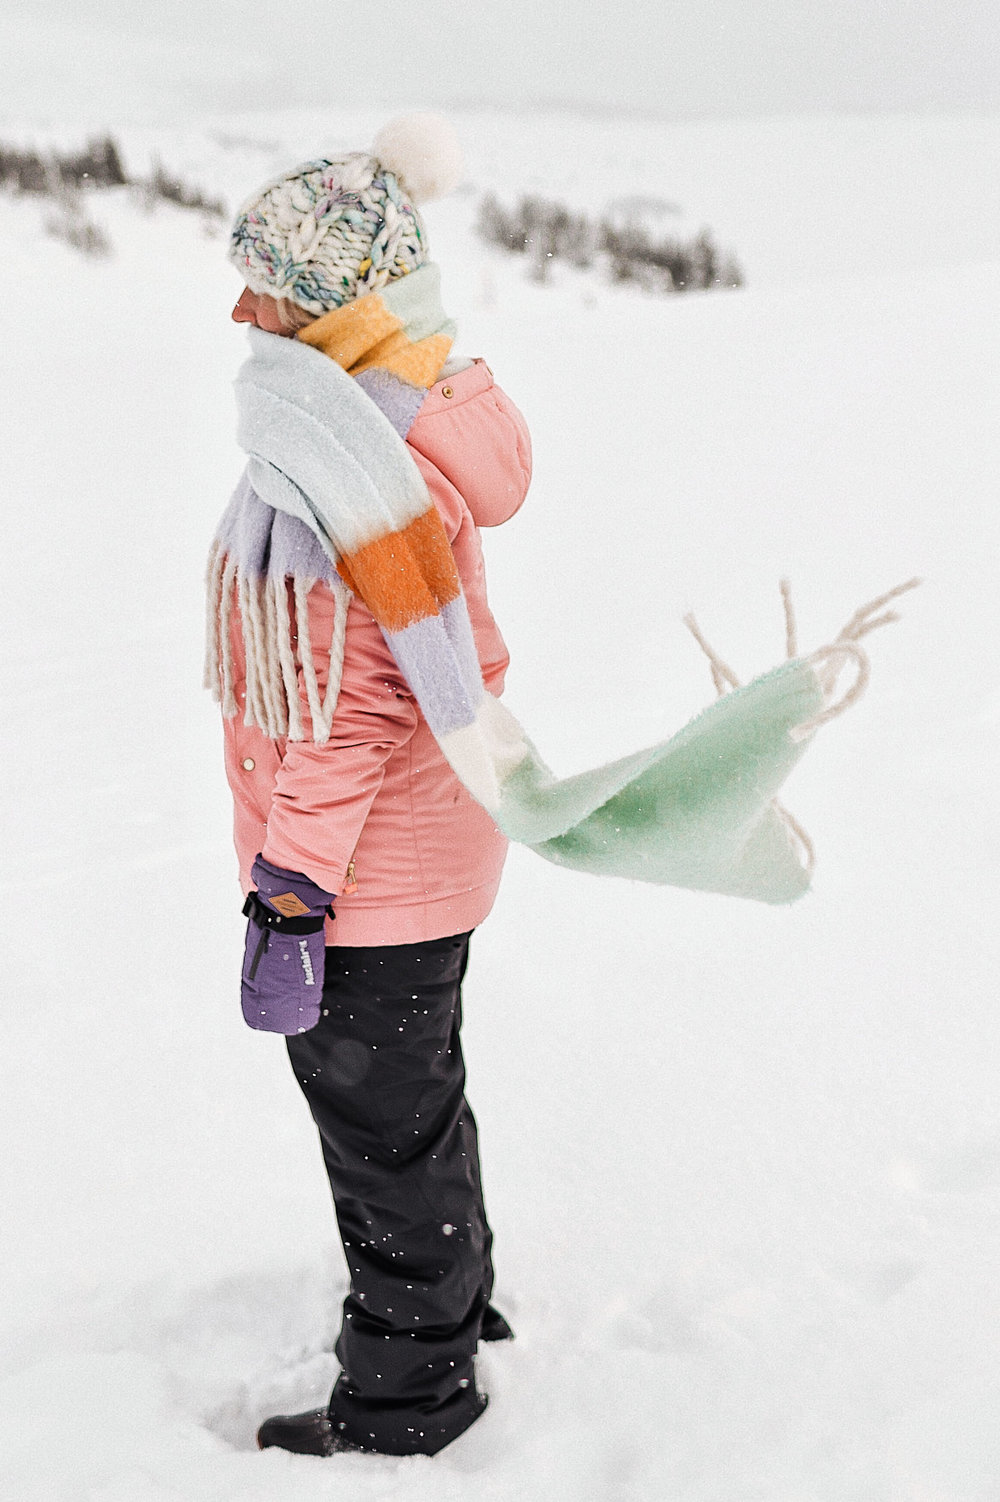 ckanani-banff-winter-a-guide-to-visiting-99.jpg